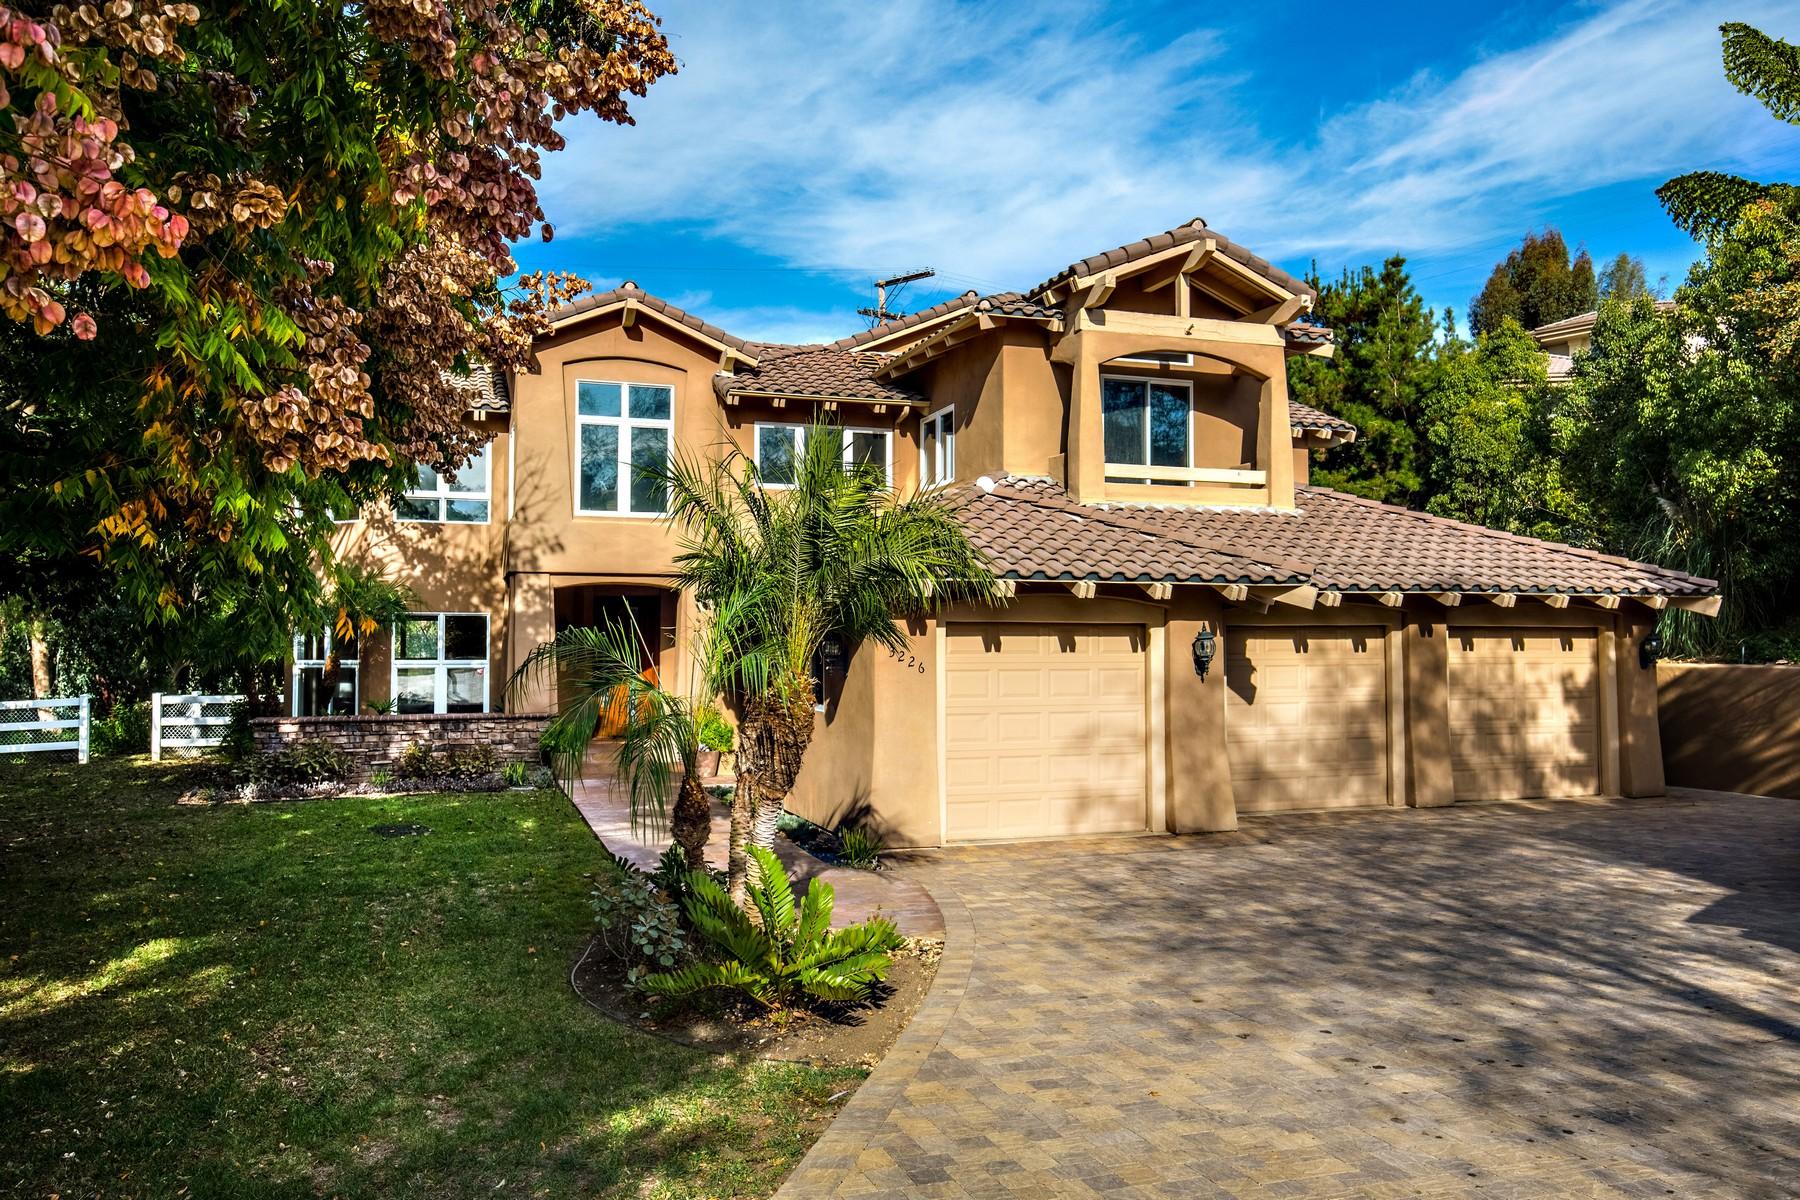 Single Family Home for Sale at 3226 Brookside Lane Encinitas, California, 92024 United States